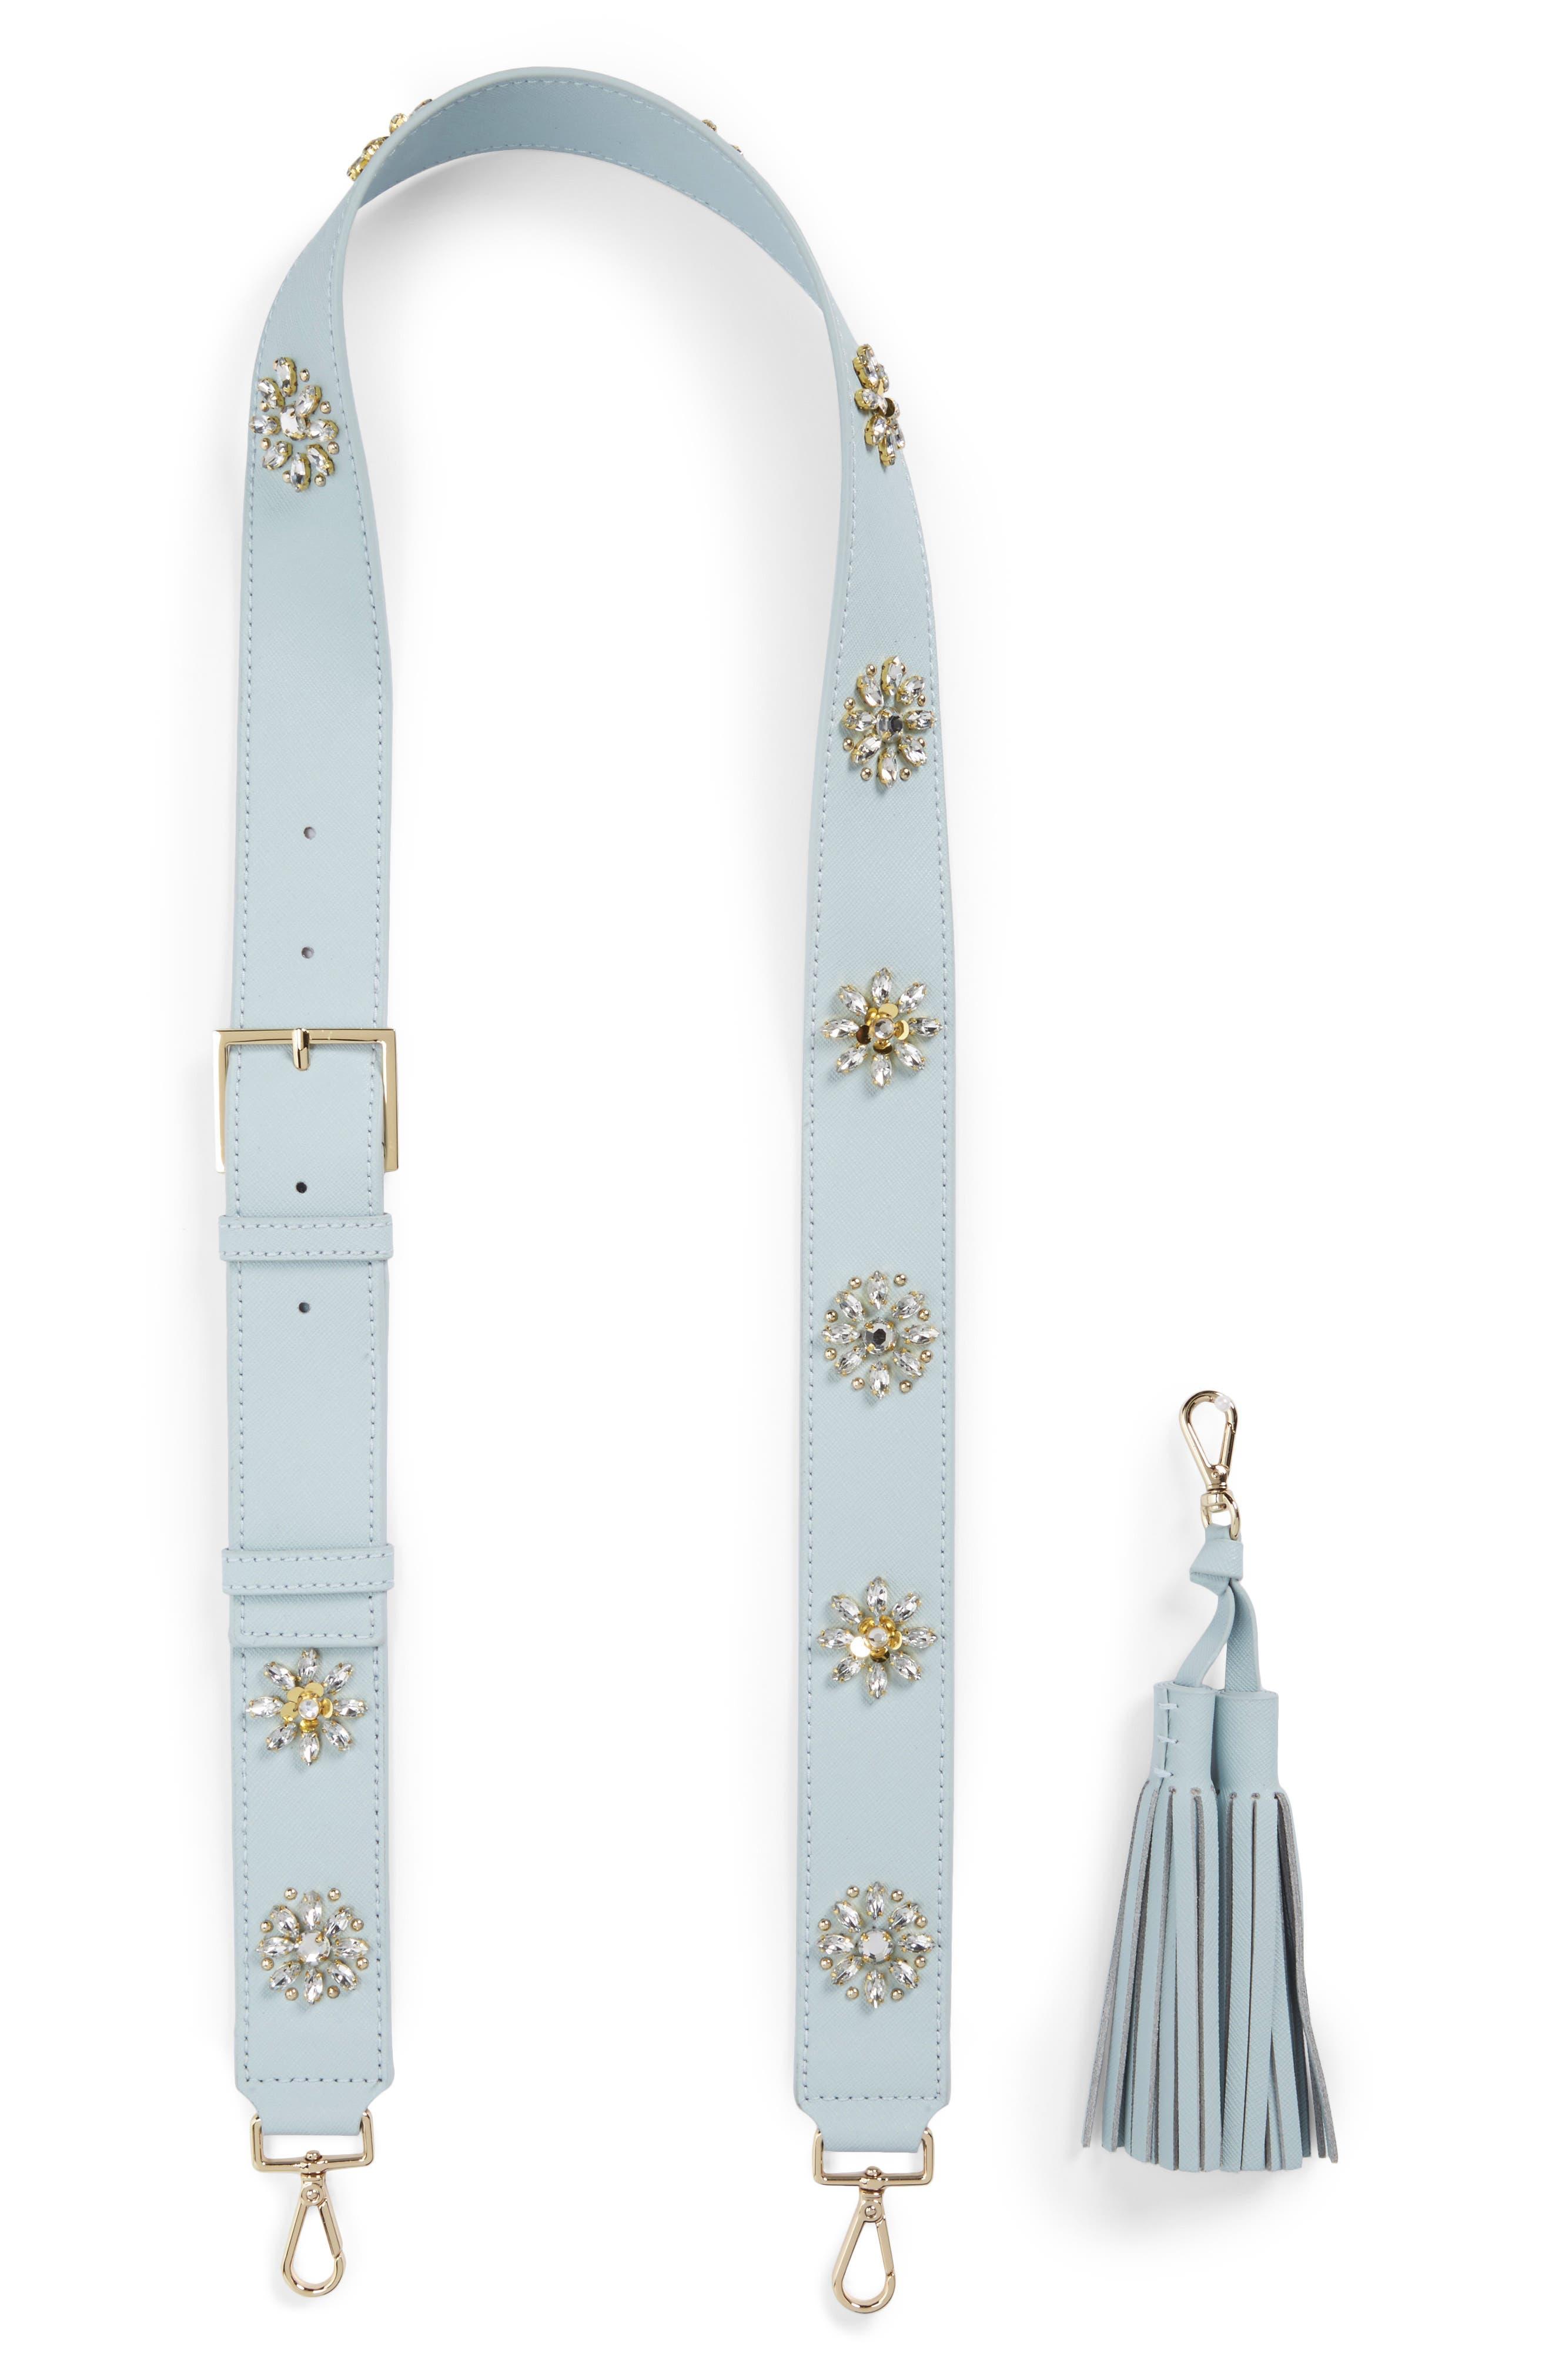 kate spade new york make it mine crystal flowers leather guitar bag strap & tassel